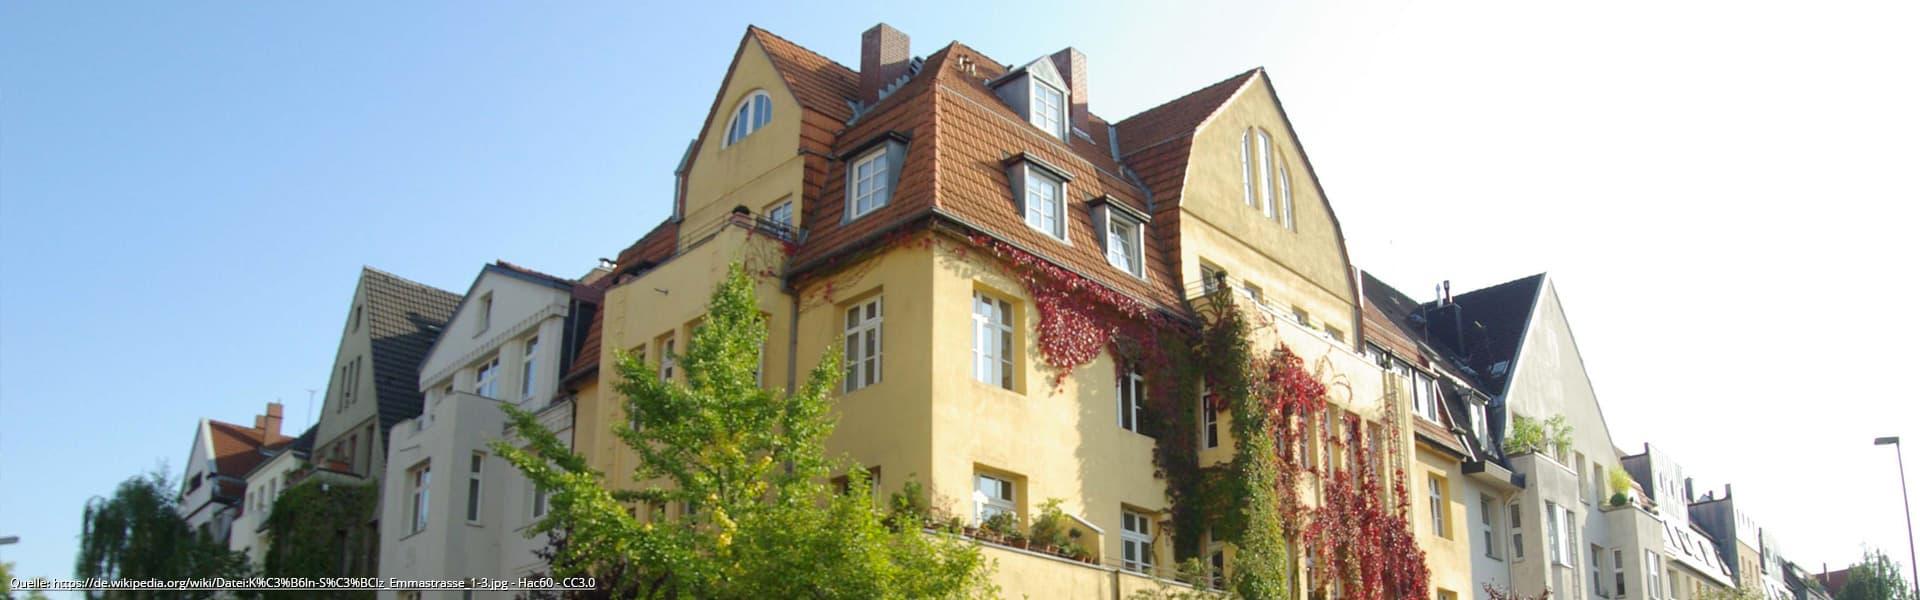 Köln Sülz Emmastrasse - Goost Immobilien